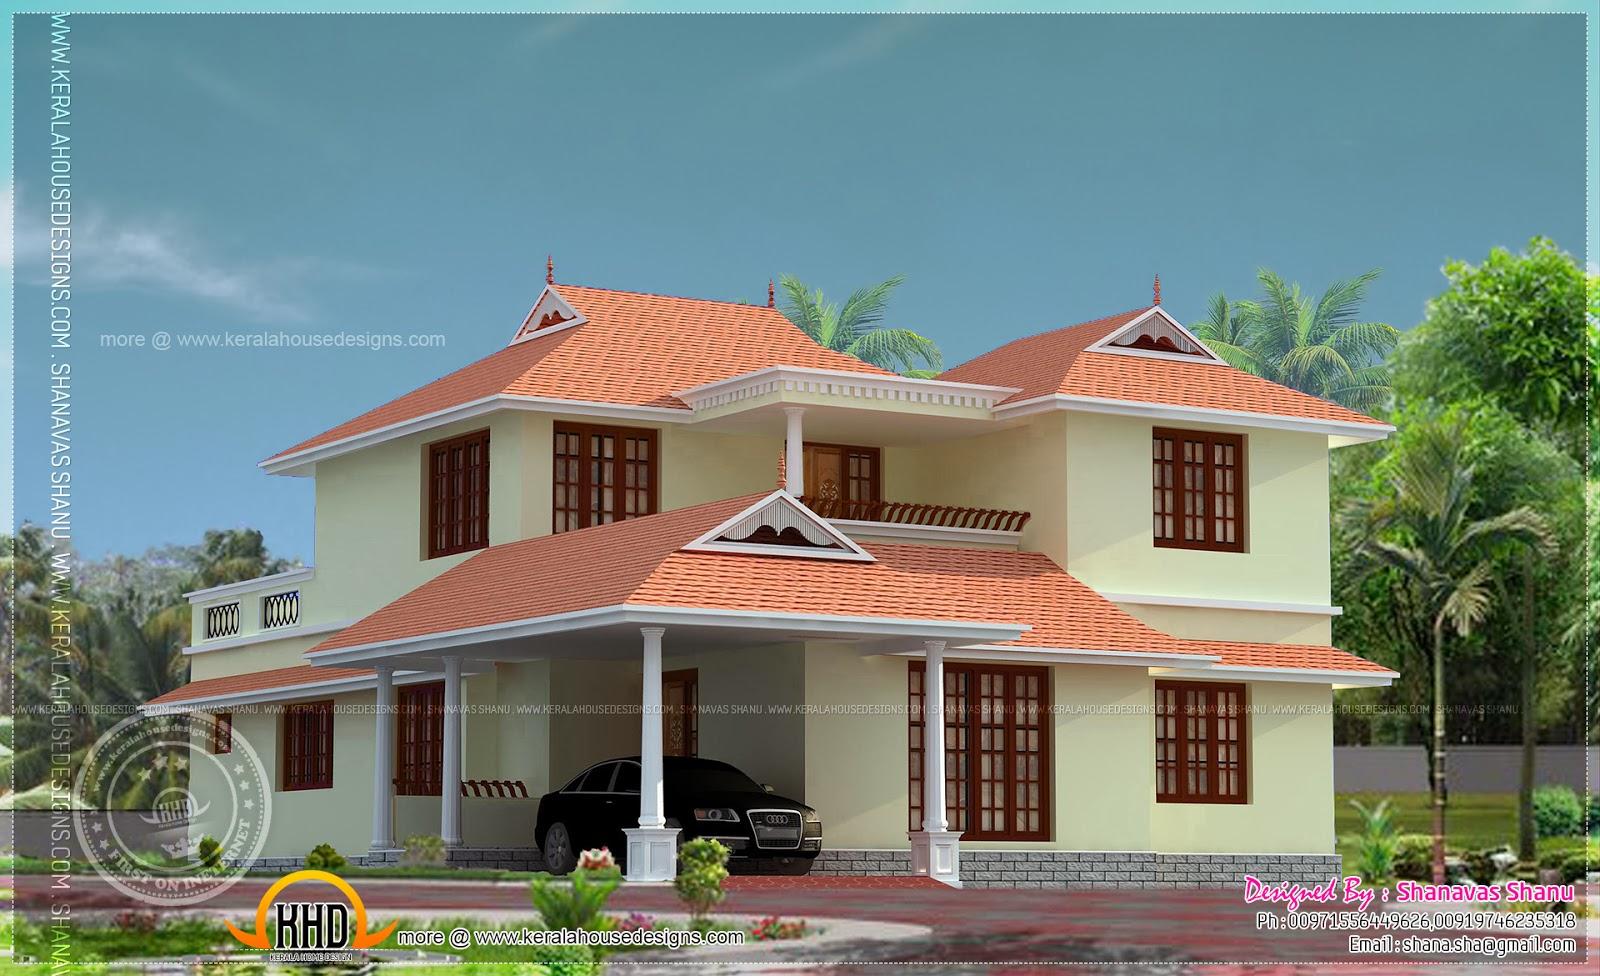 Beautiful kerala house photo with floor plan kerala home for Beautiful kerala house plans